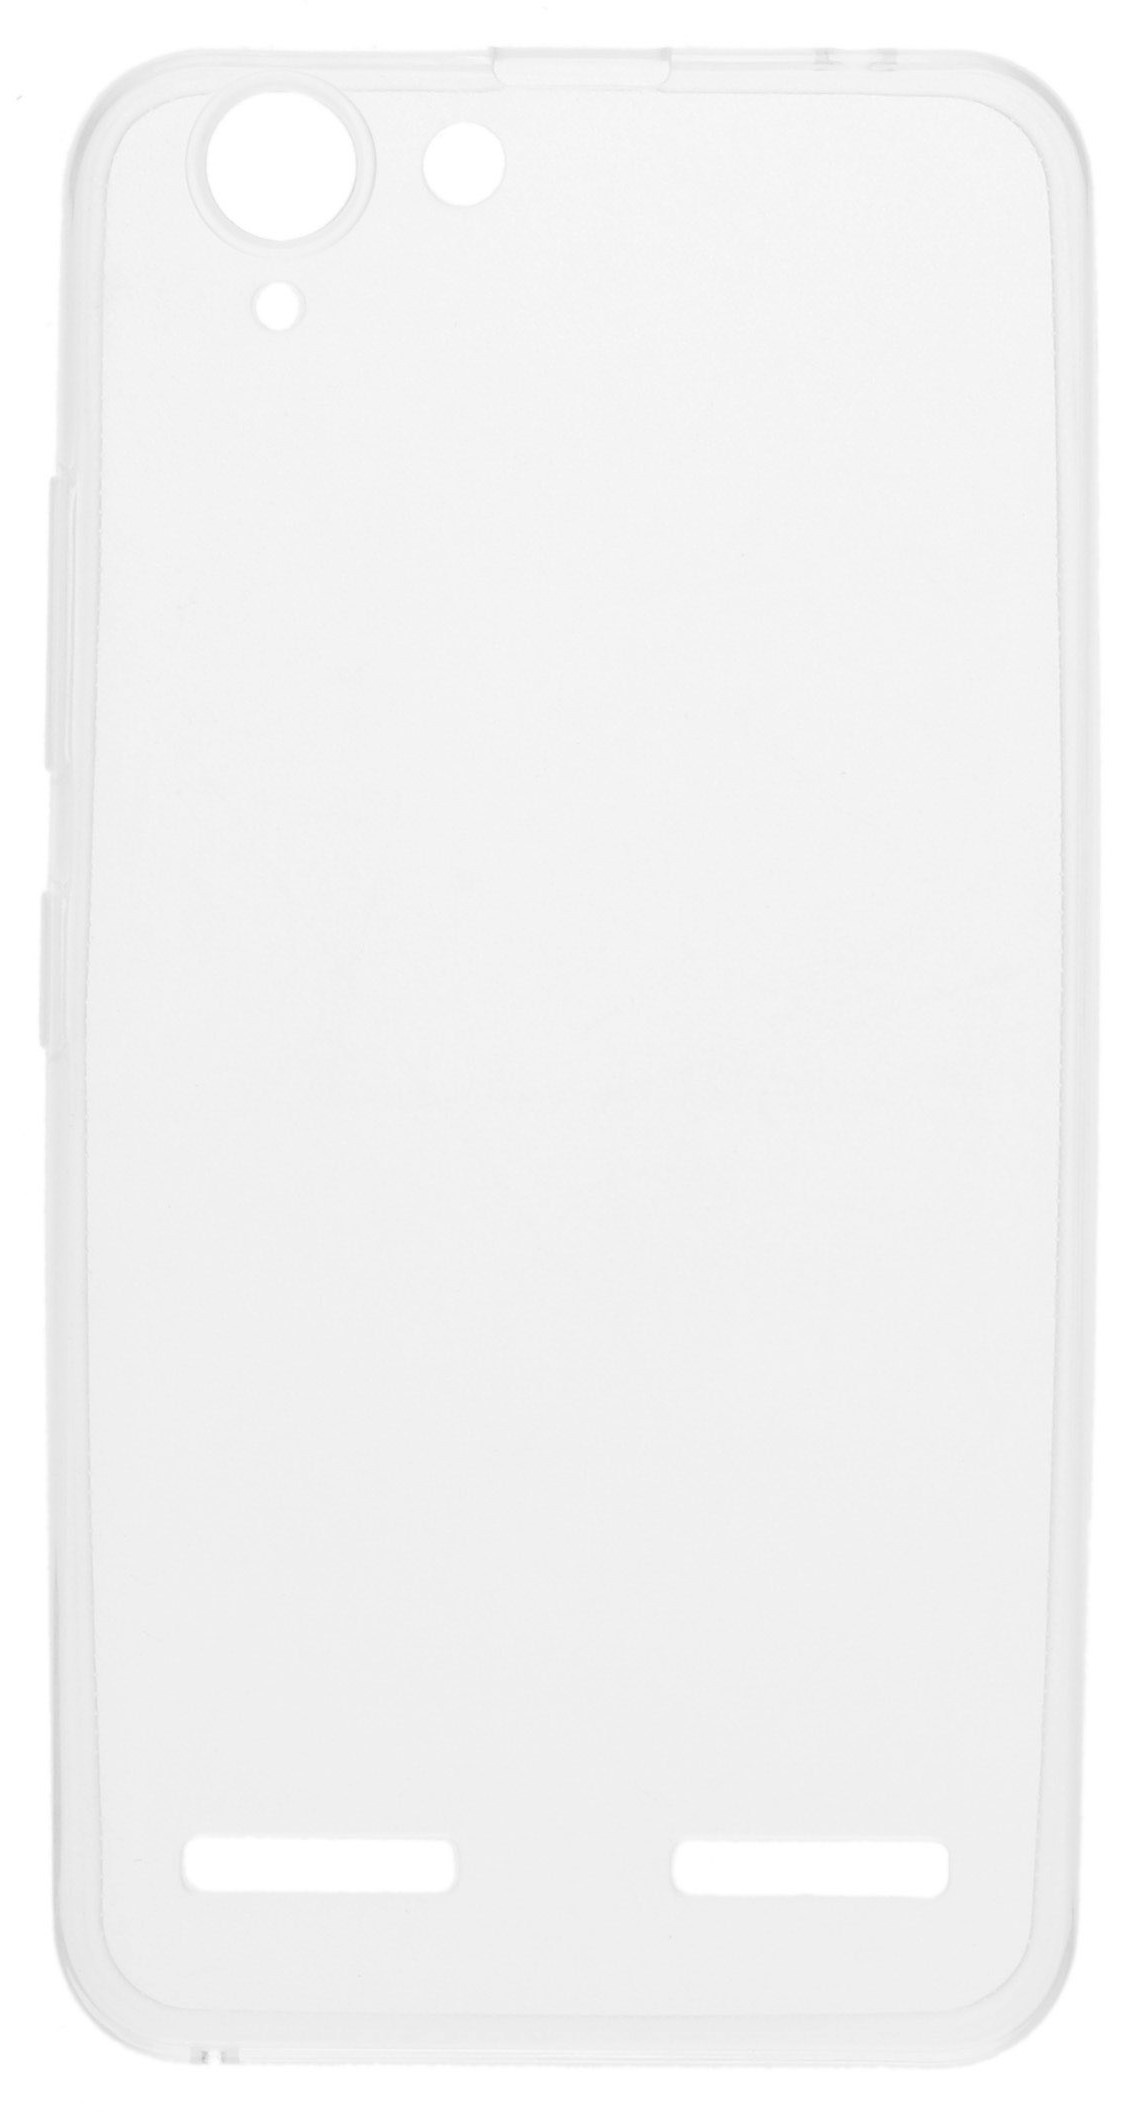 Чехол для сотового телефона skinBOX Slim Silicone, 4630042528079, прозрачный цена и фото